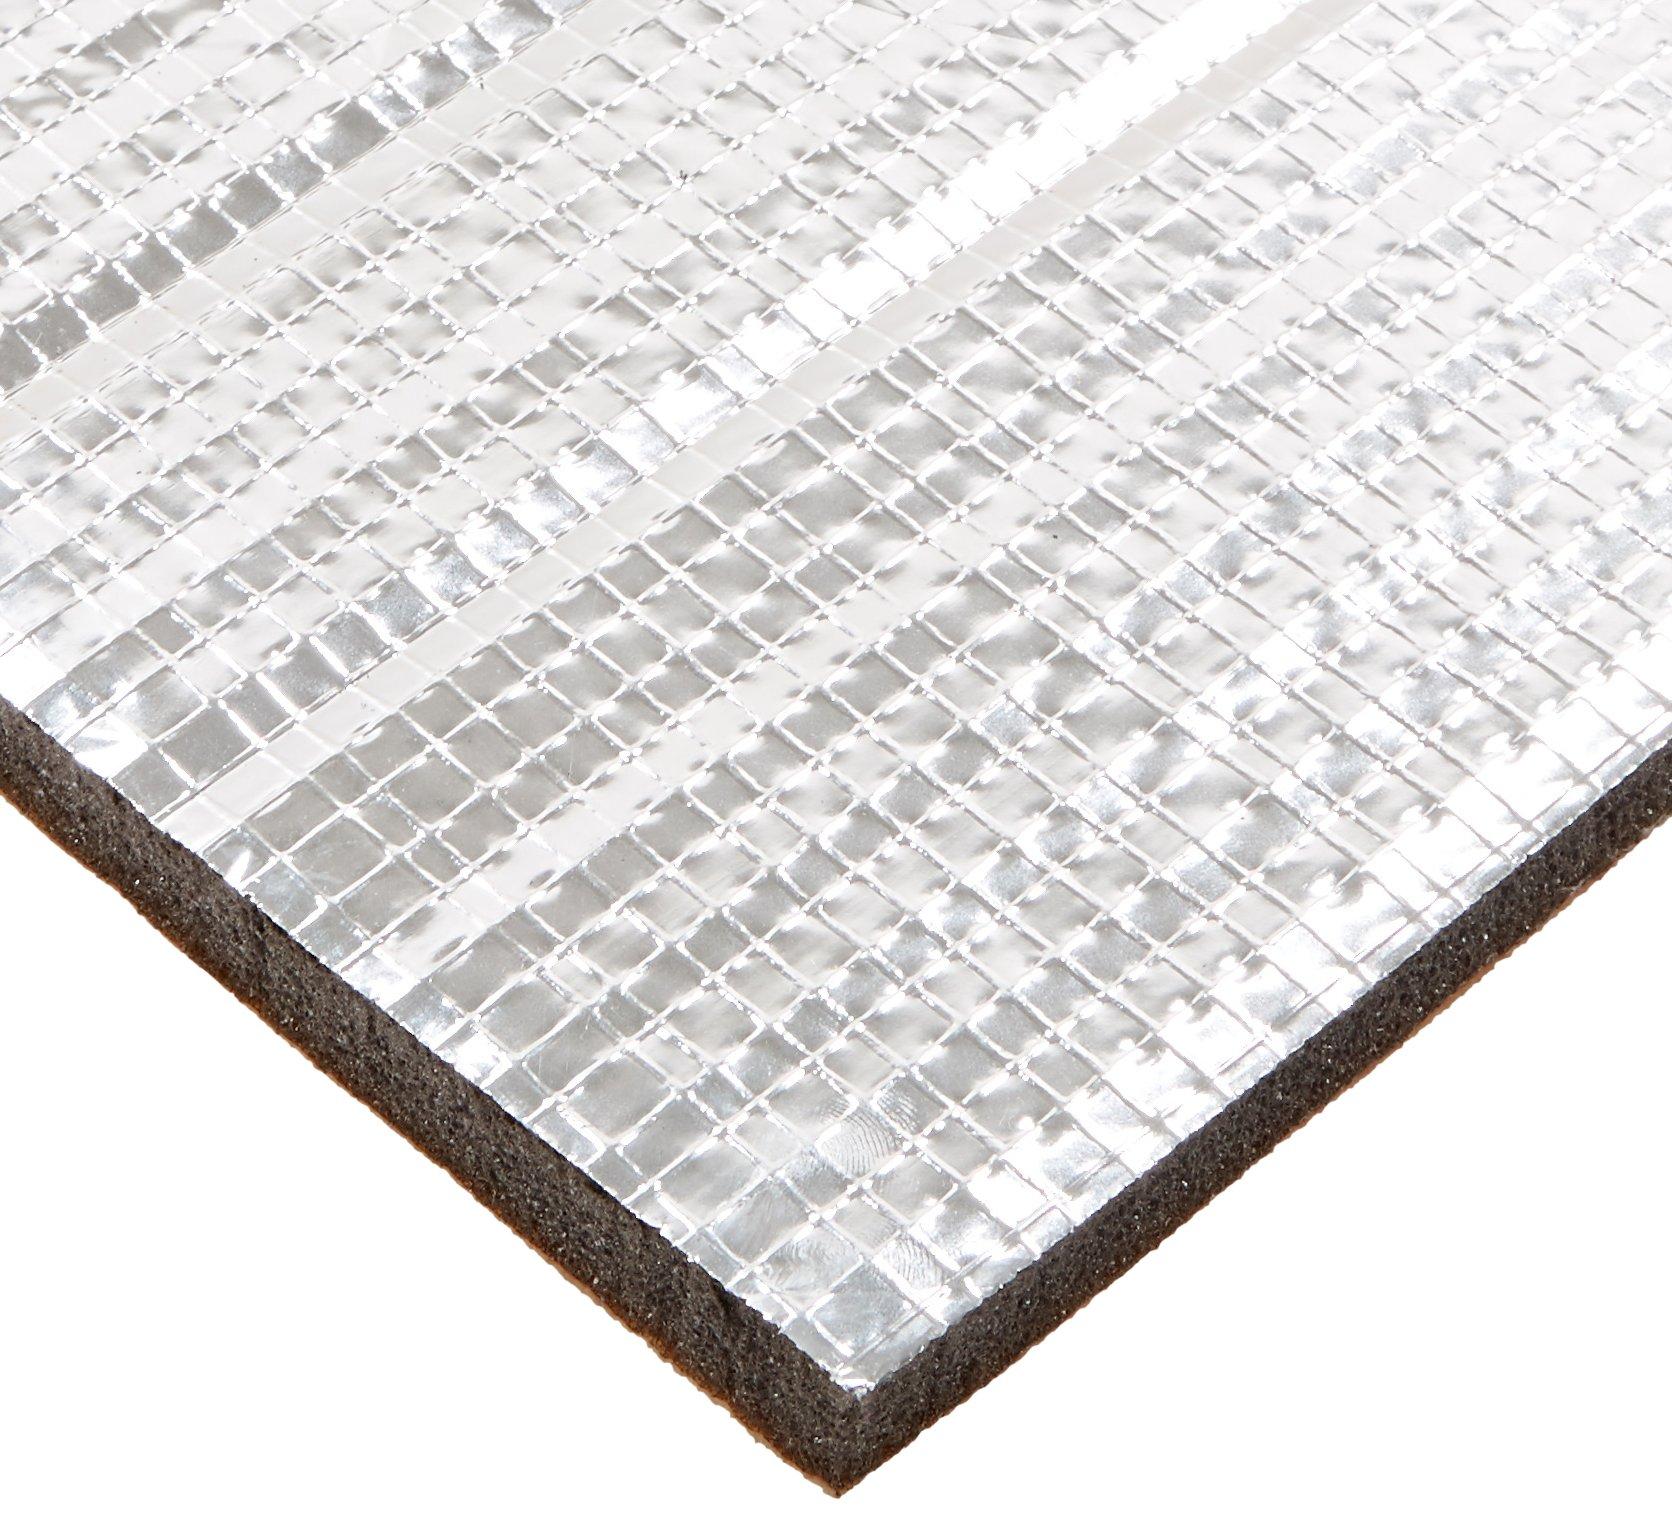 Dynamat 11905 Hoodliner 32'' x 54'' x 3/4'' Thick Self-Adhesive Sound Deadener